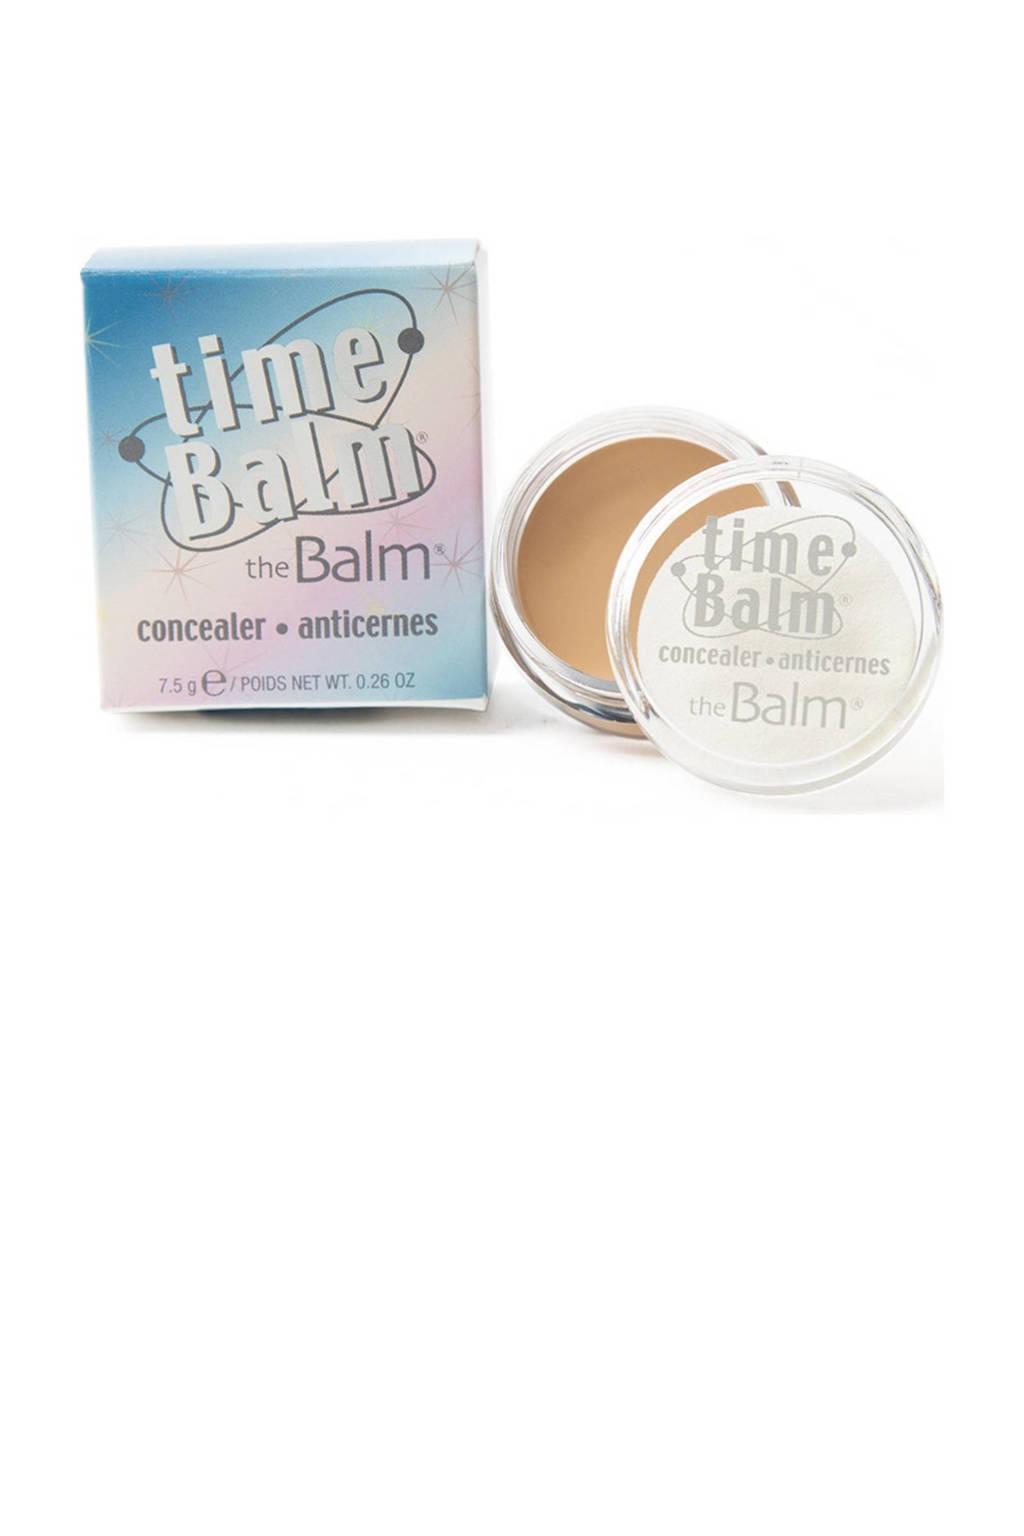 The Balm timeBalm concealer - Med/Dark, medium/dark